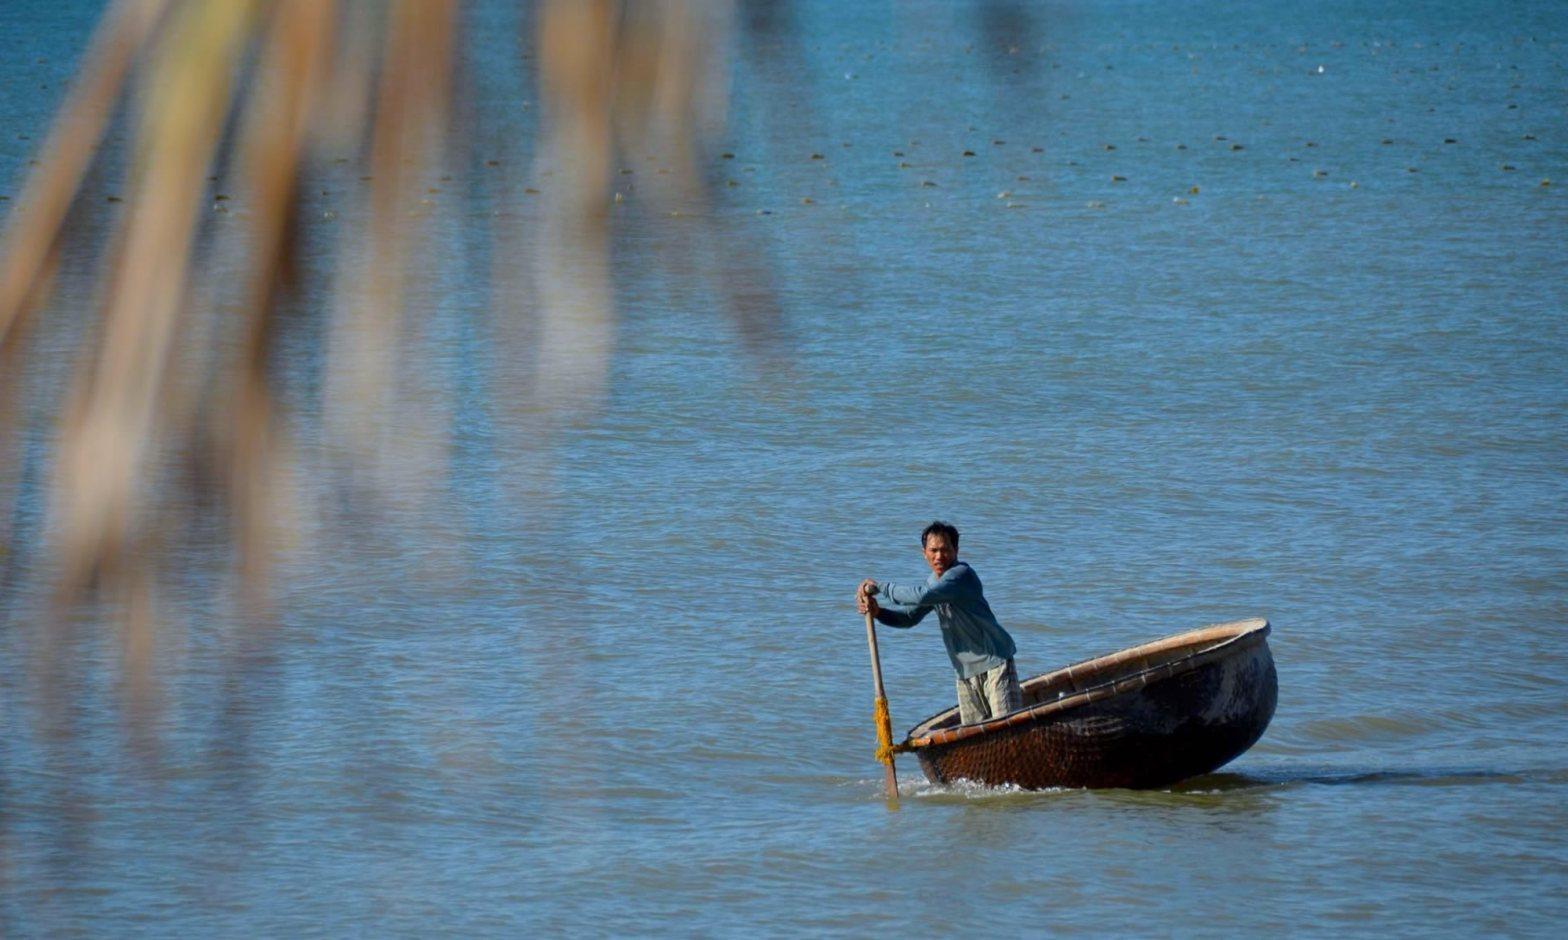 A man paddles a Vietnamese basket boat through the water near Mui Ne.